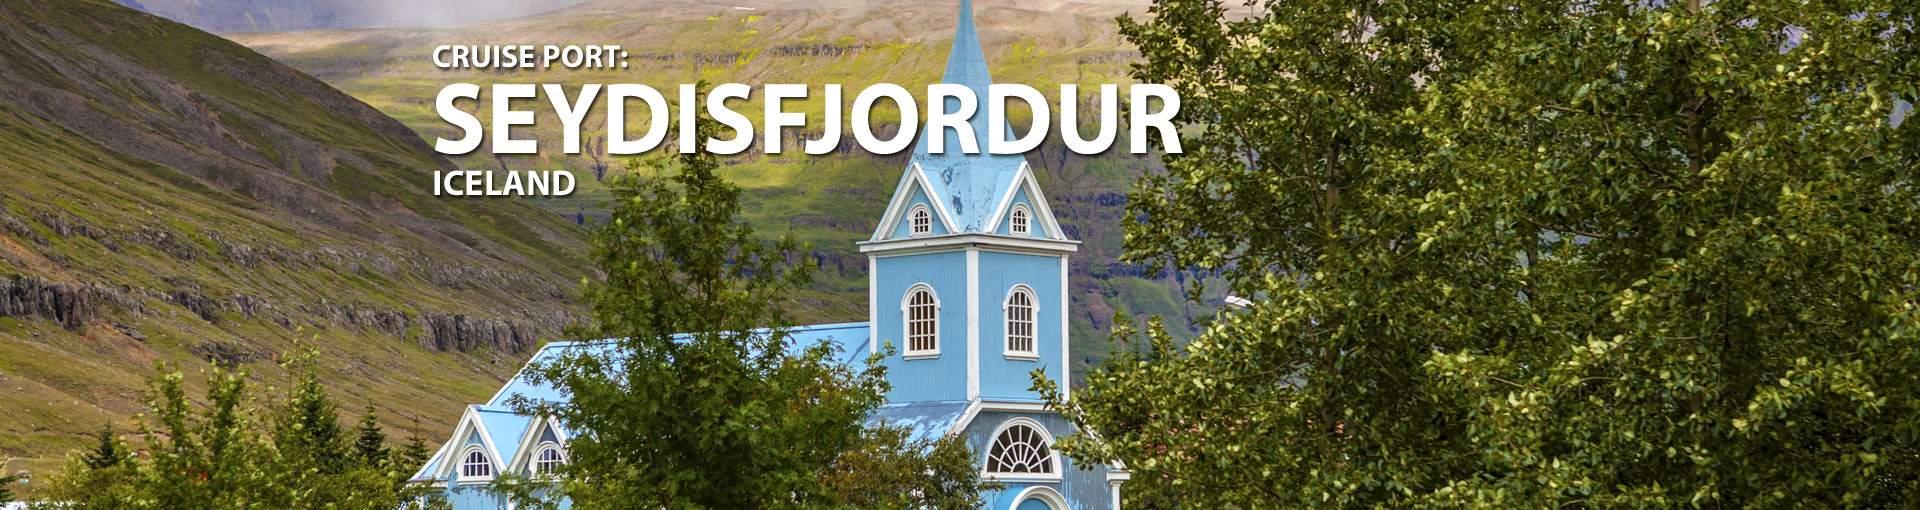 Cruises to Seydisfjordur, Iceland